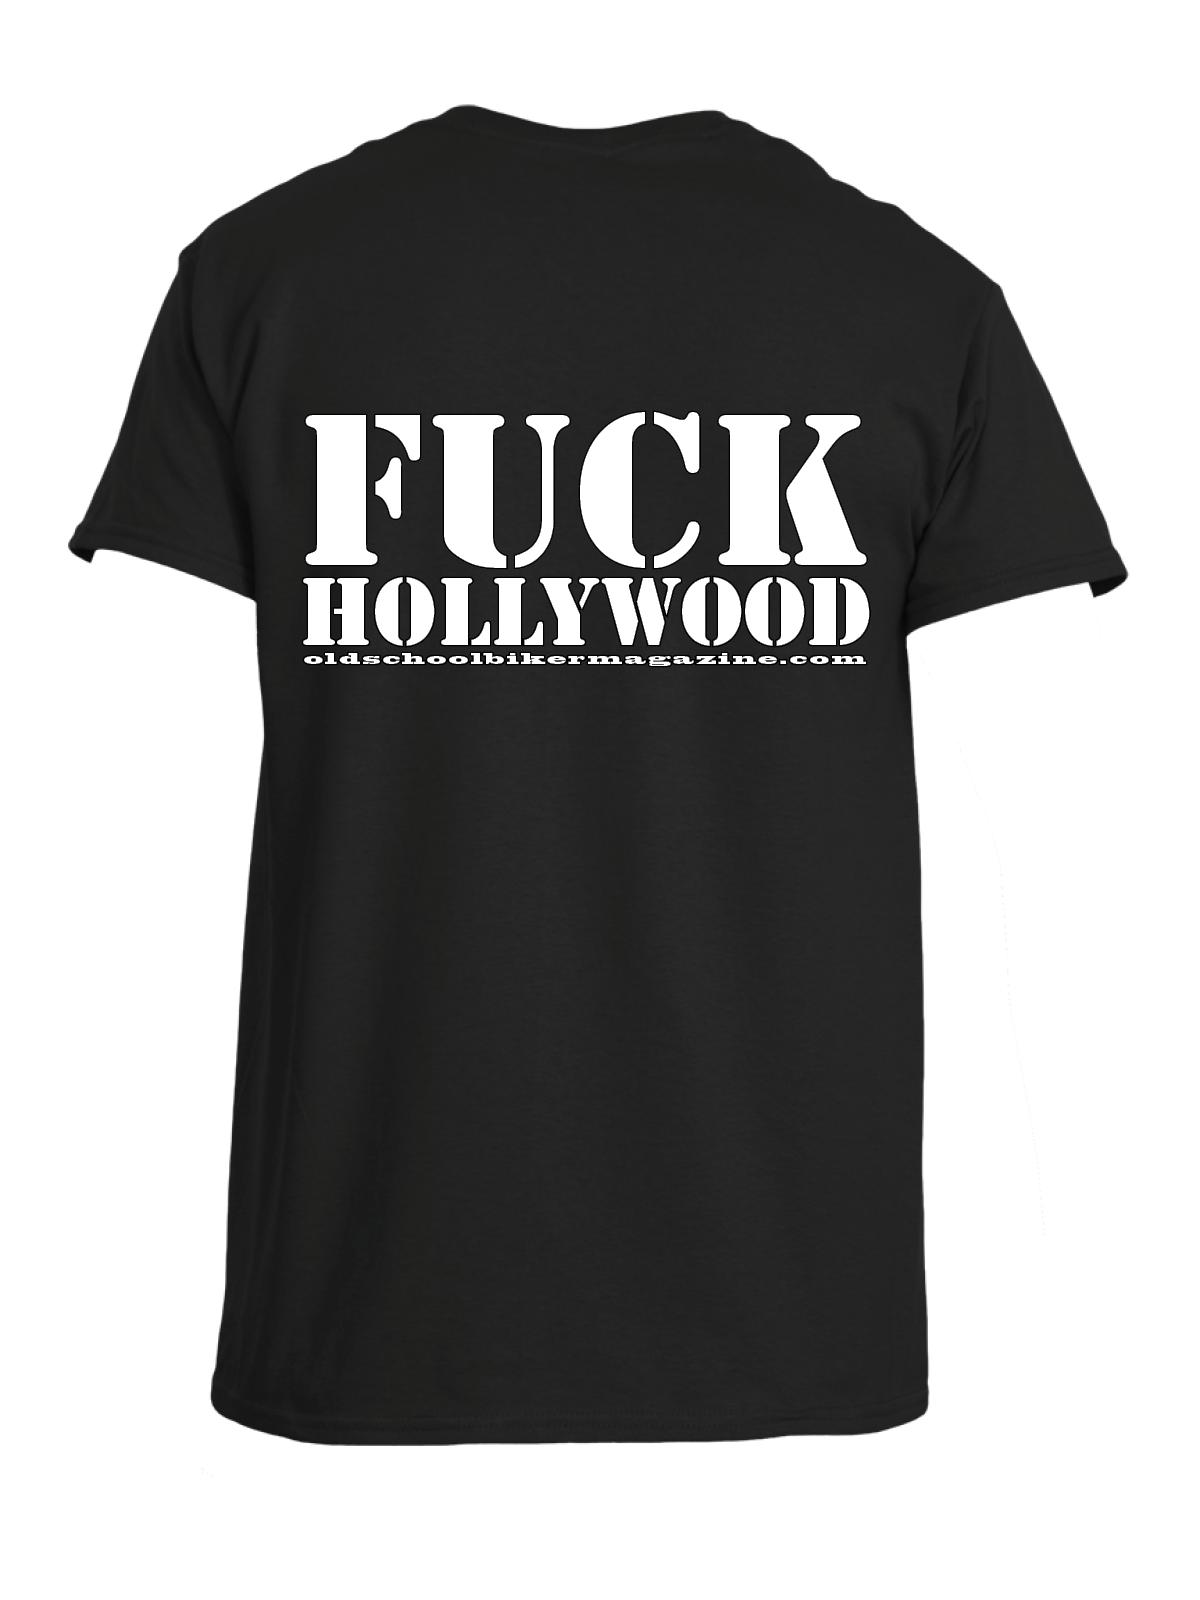 c527afb00 Fuck Hollywood T-shirt - Old School Biker